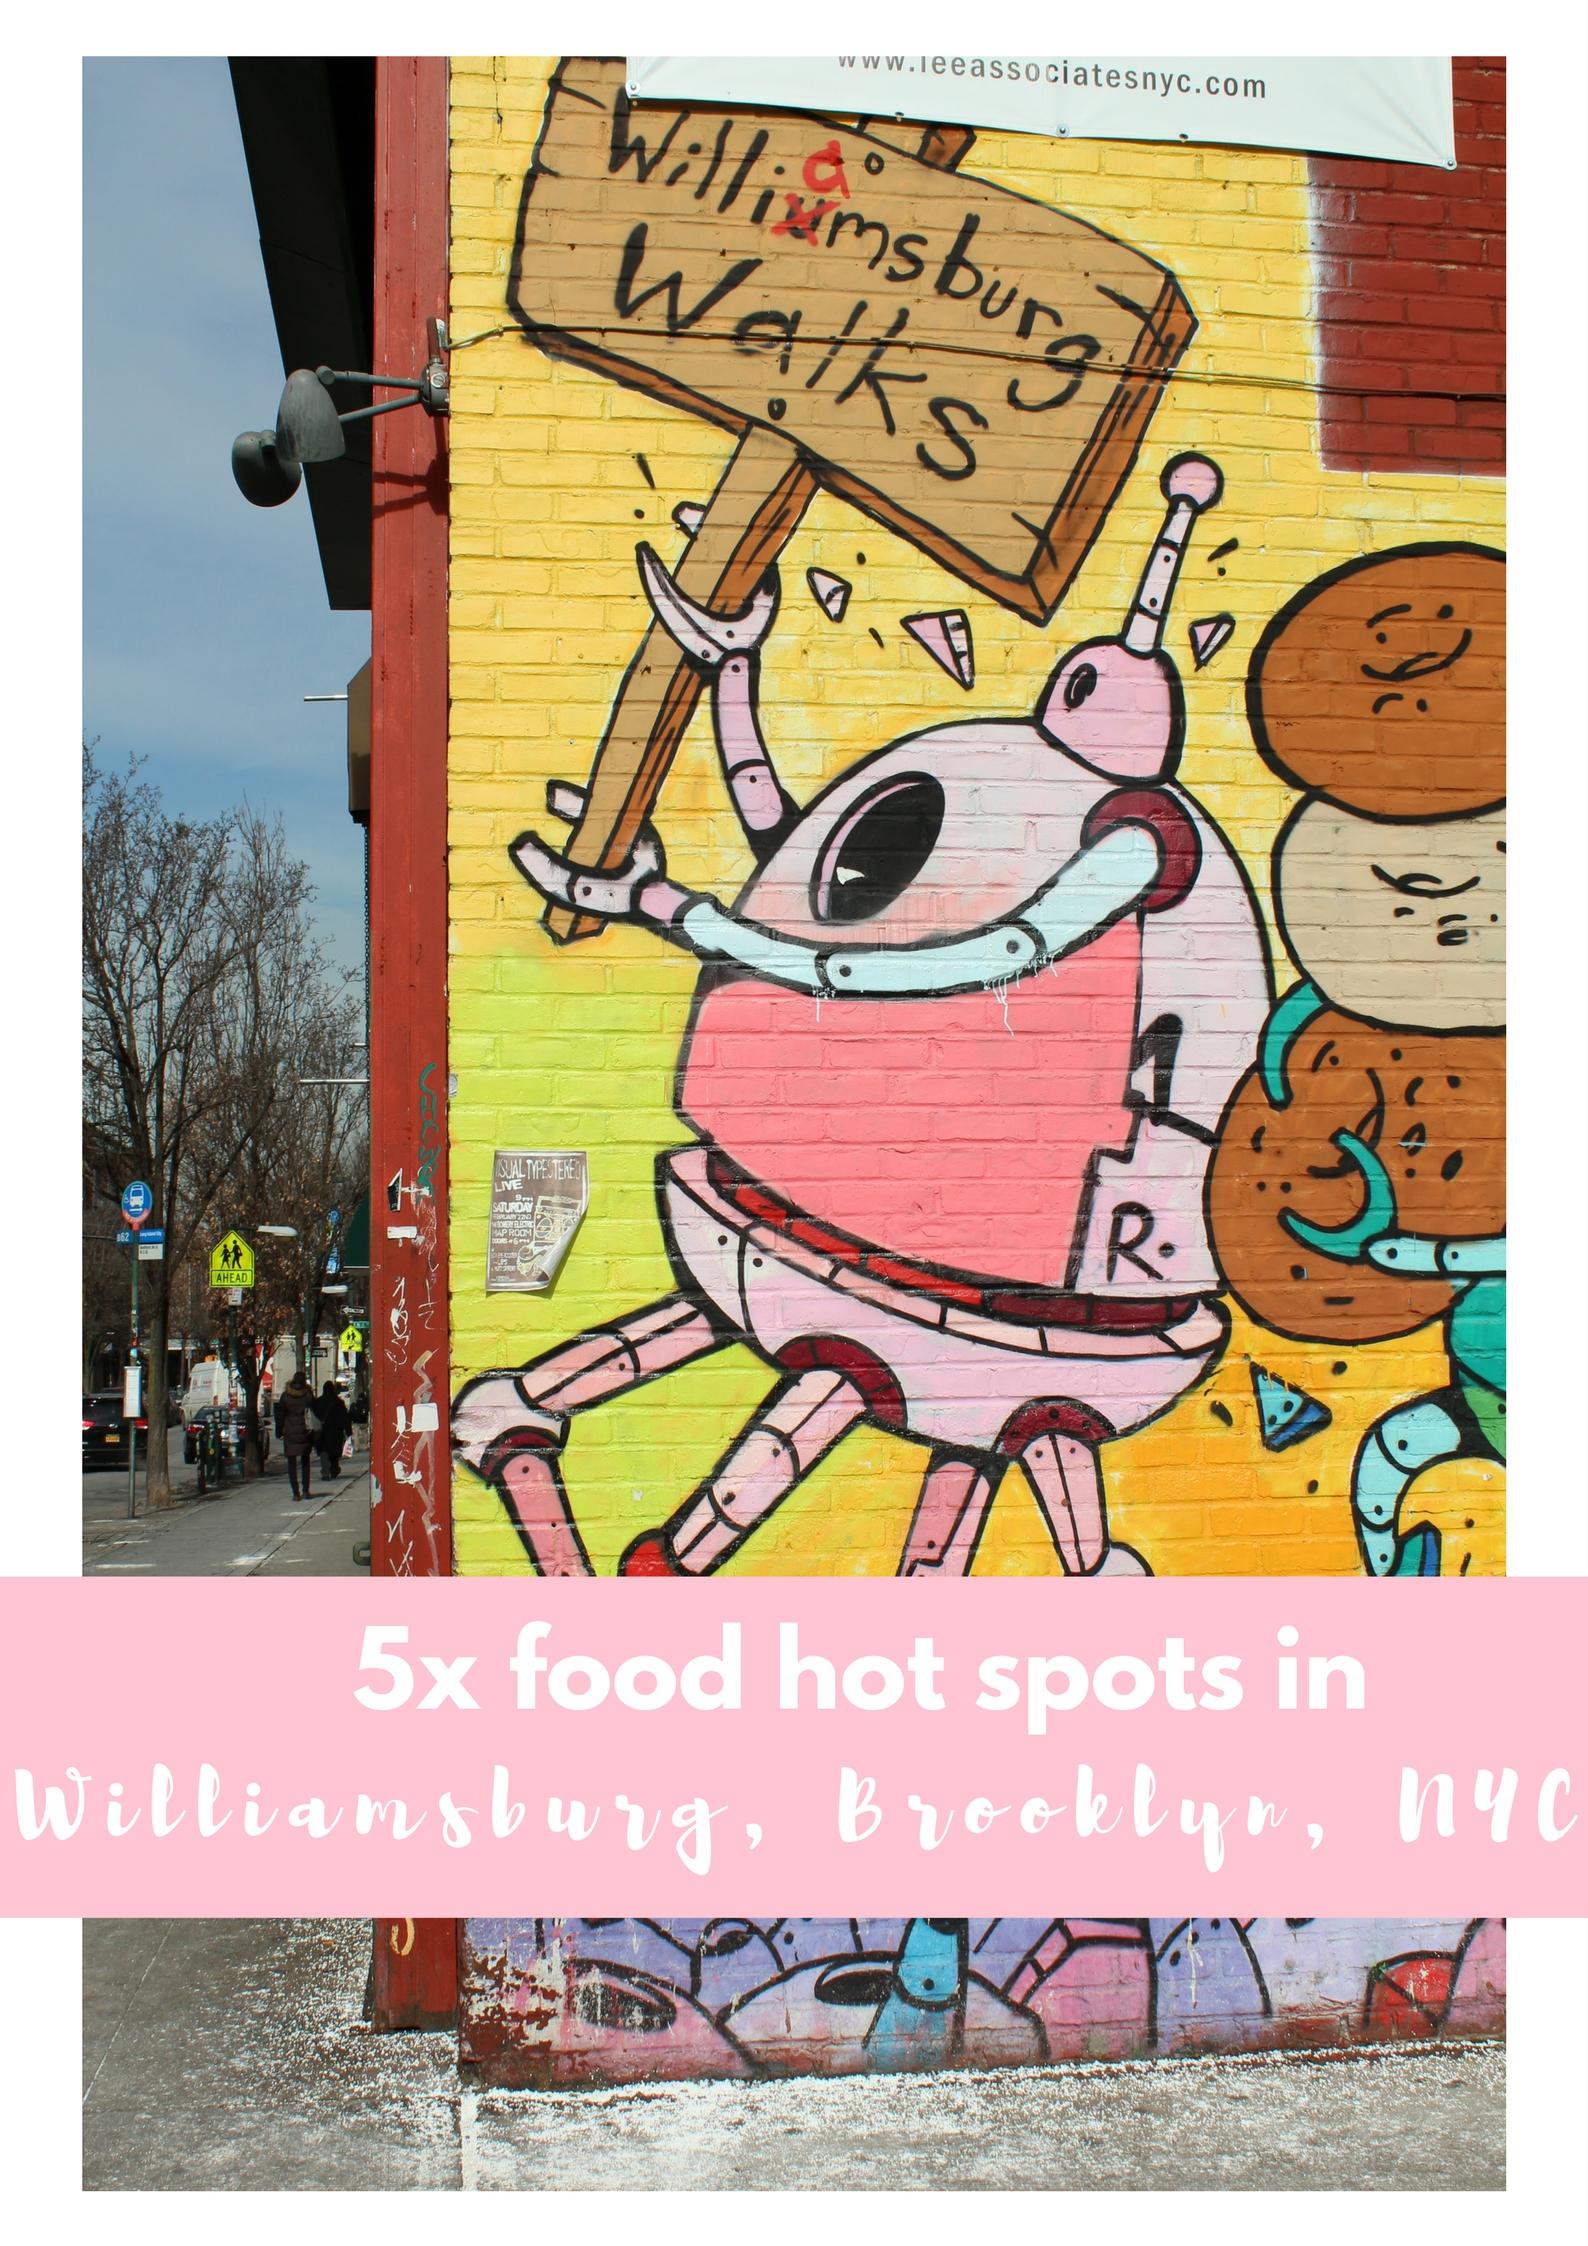 5 cool food hot spots in Williamsburg, Brooklyn, New York - Map of Joy